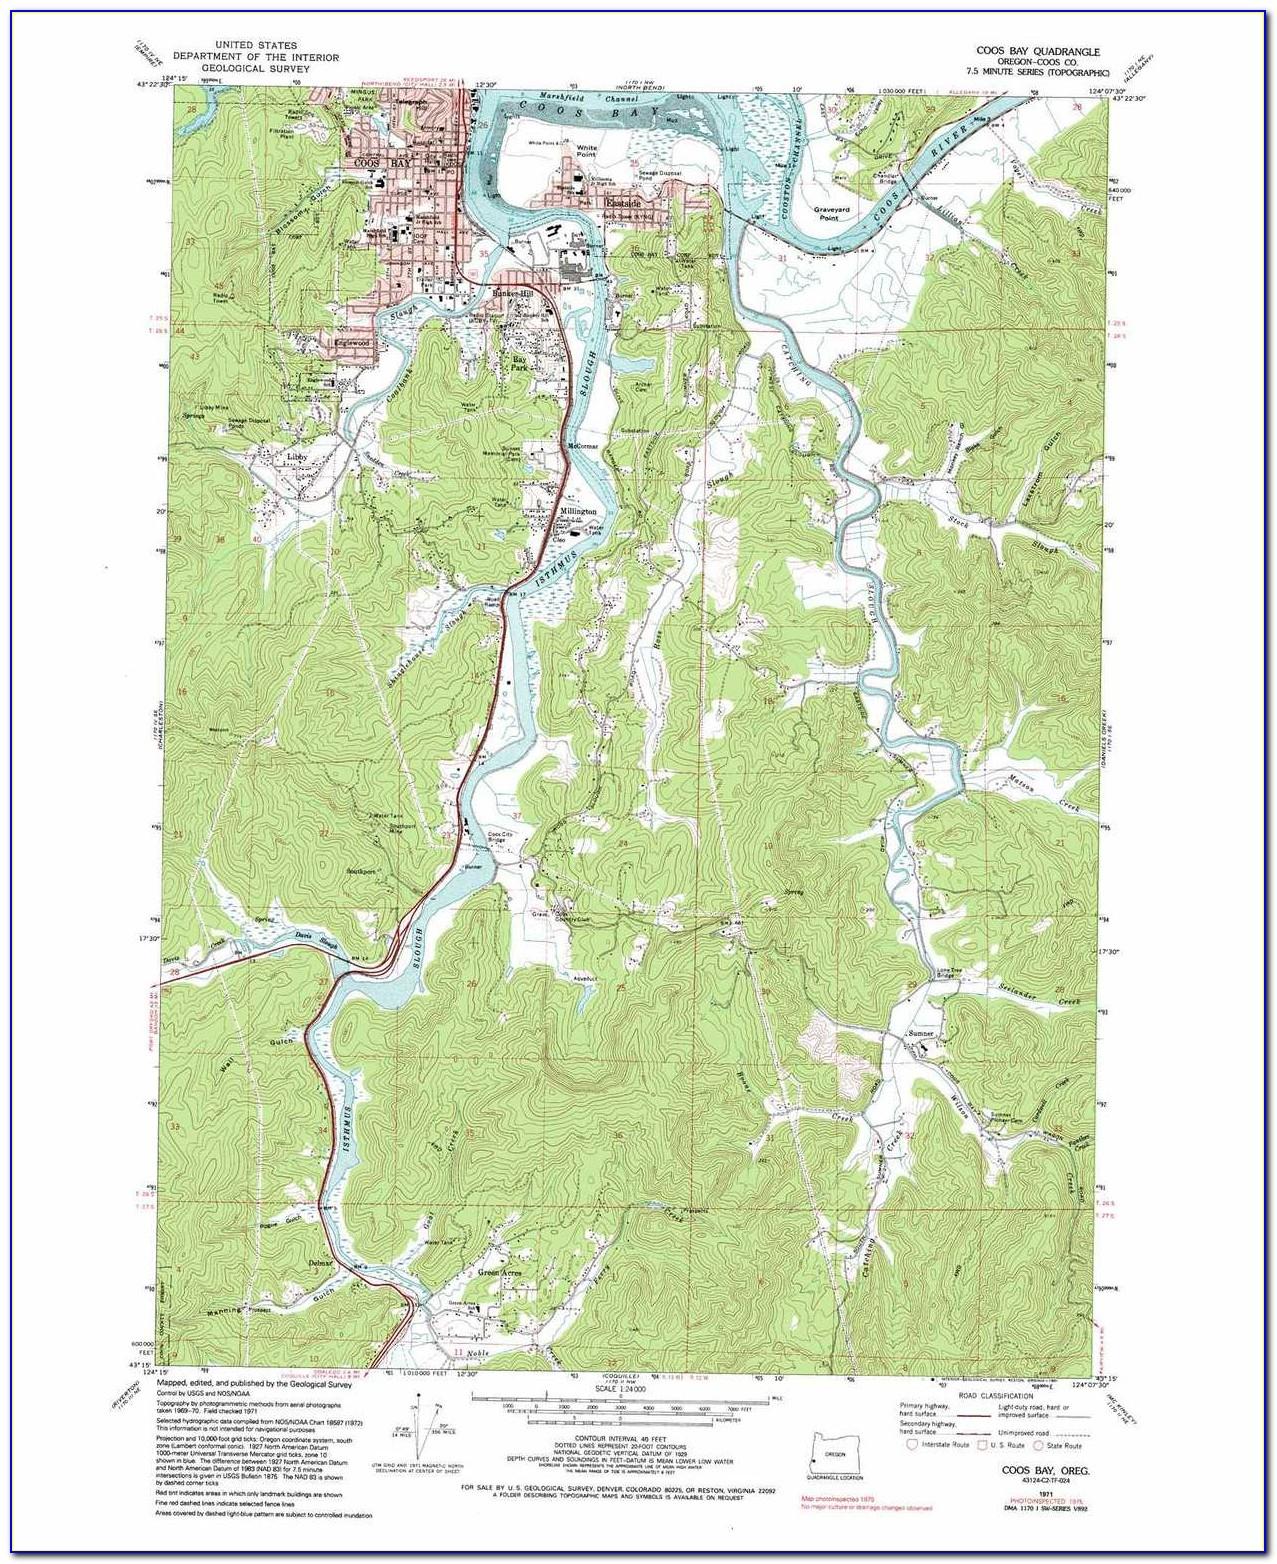 Garmin Oregon Topo Maps